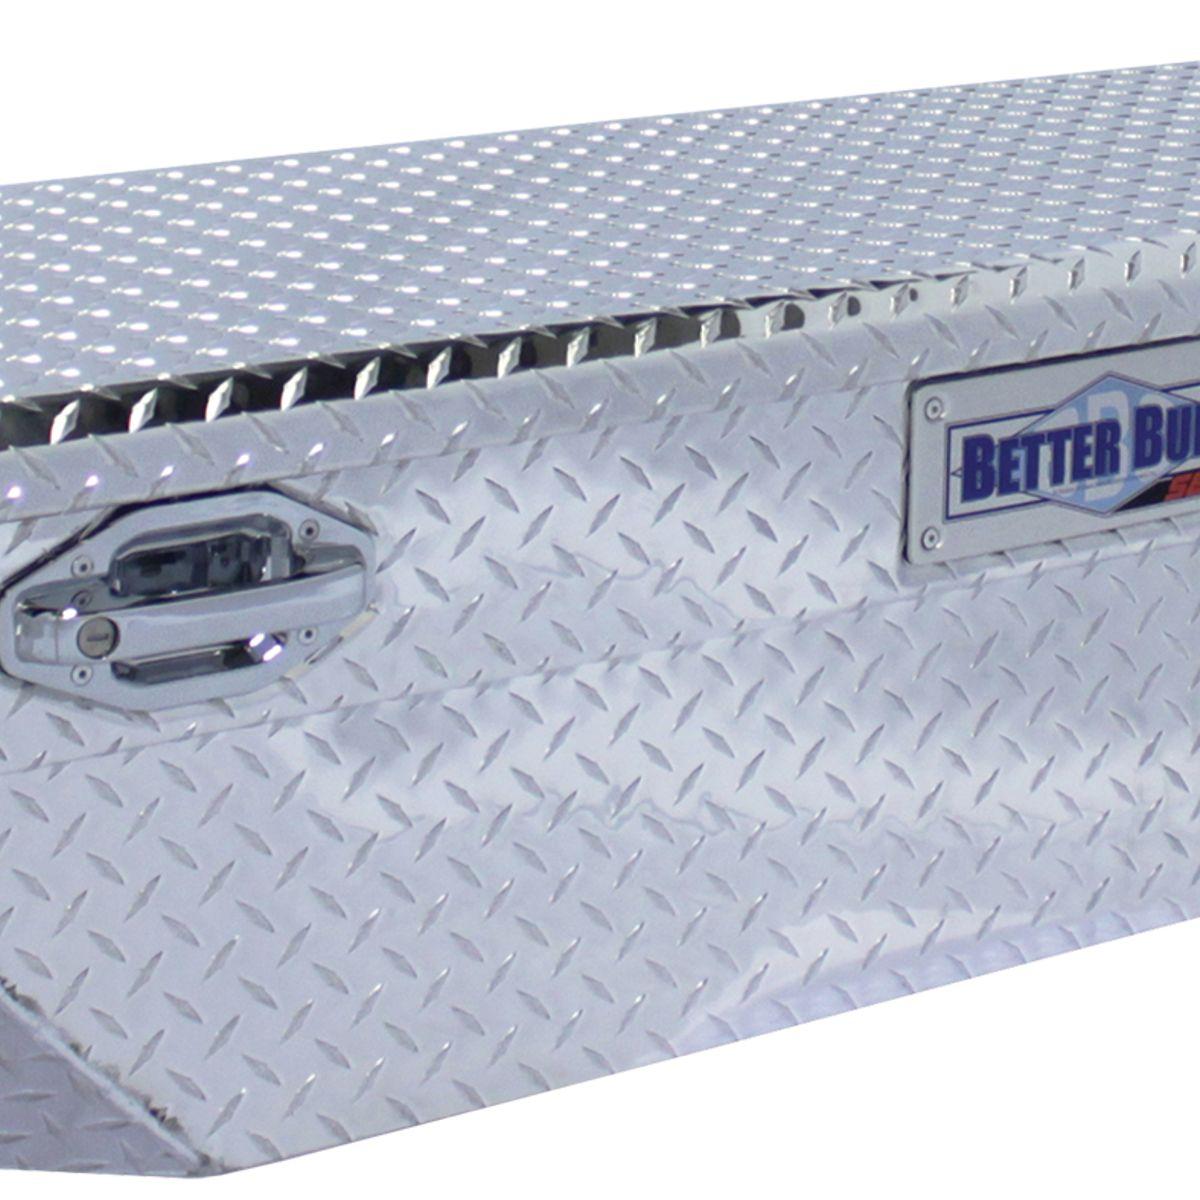 Better Built 79011018 Single Lid Tool Box